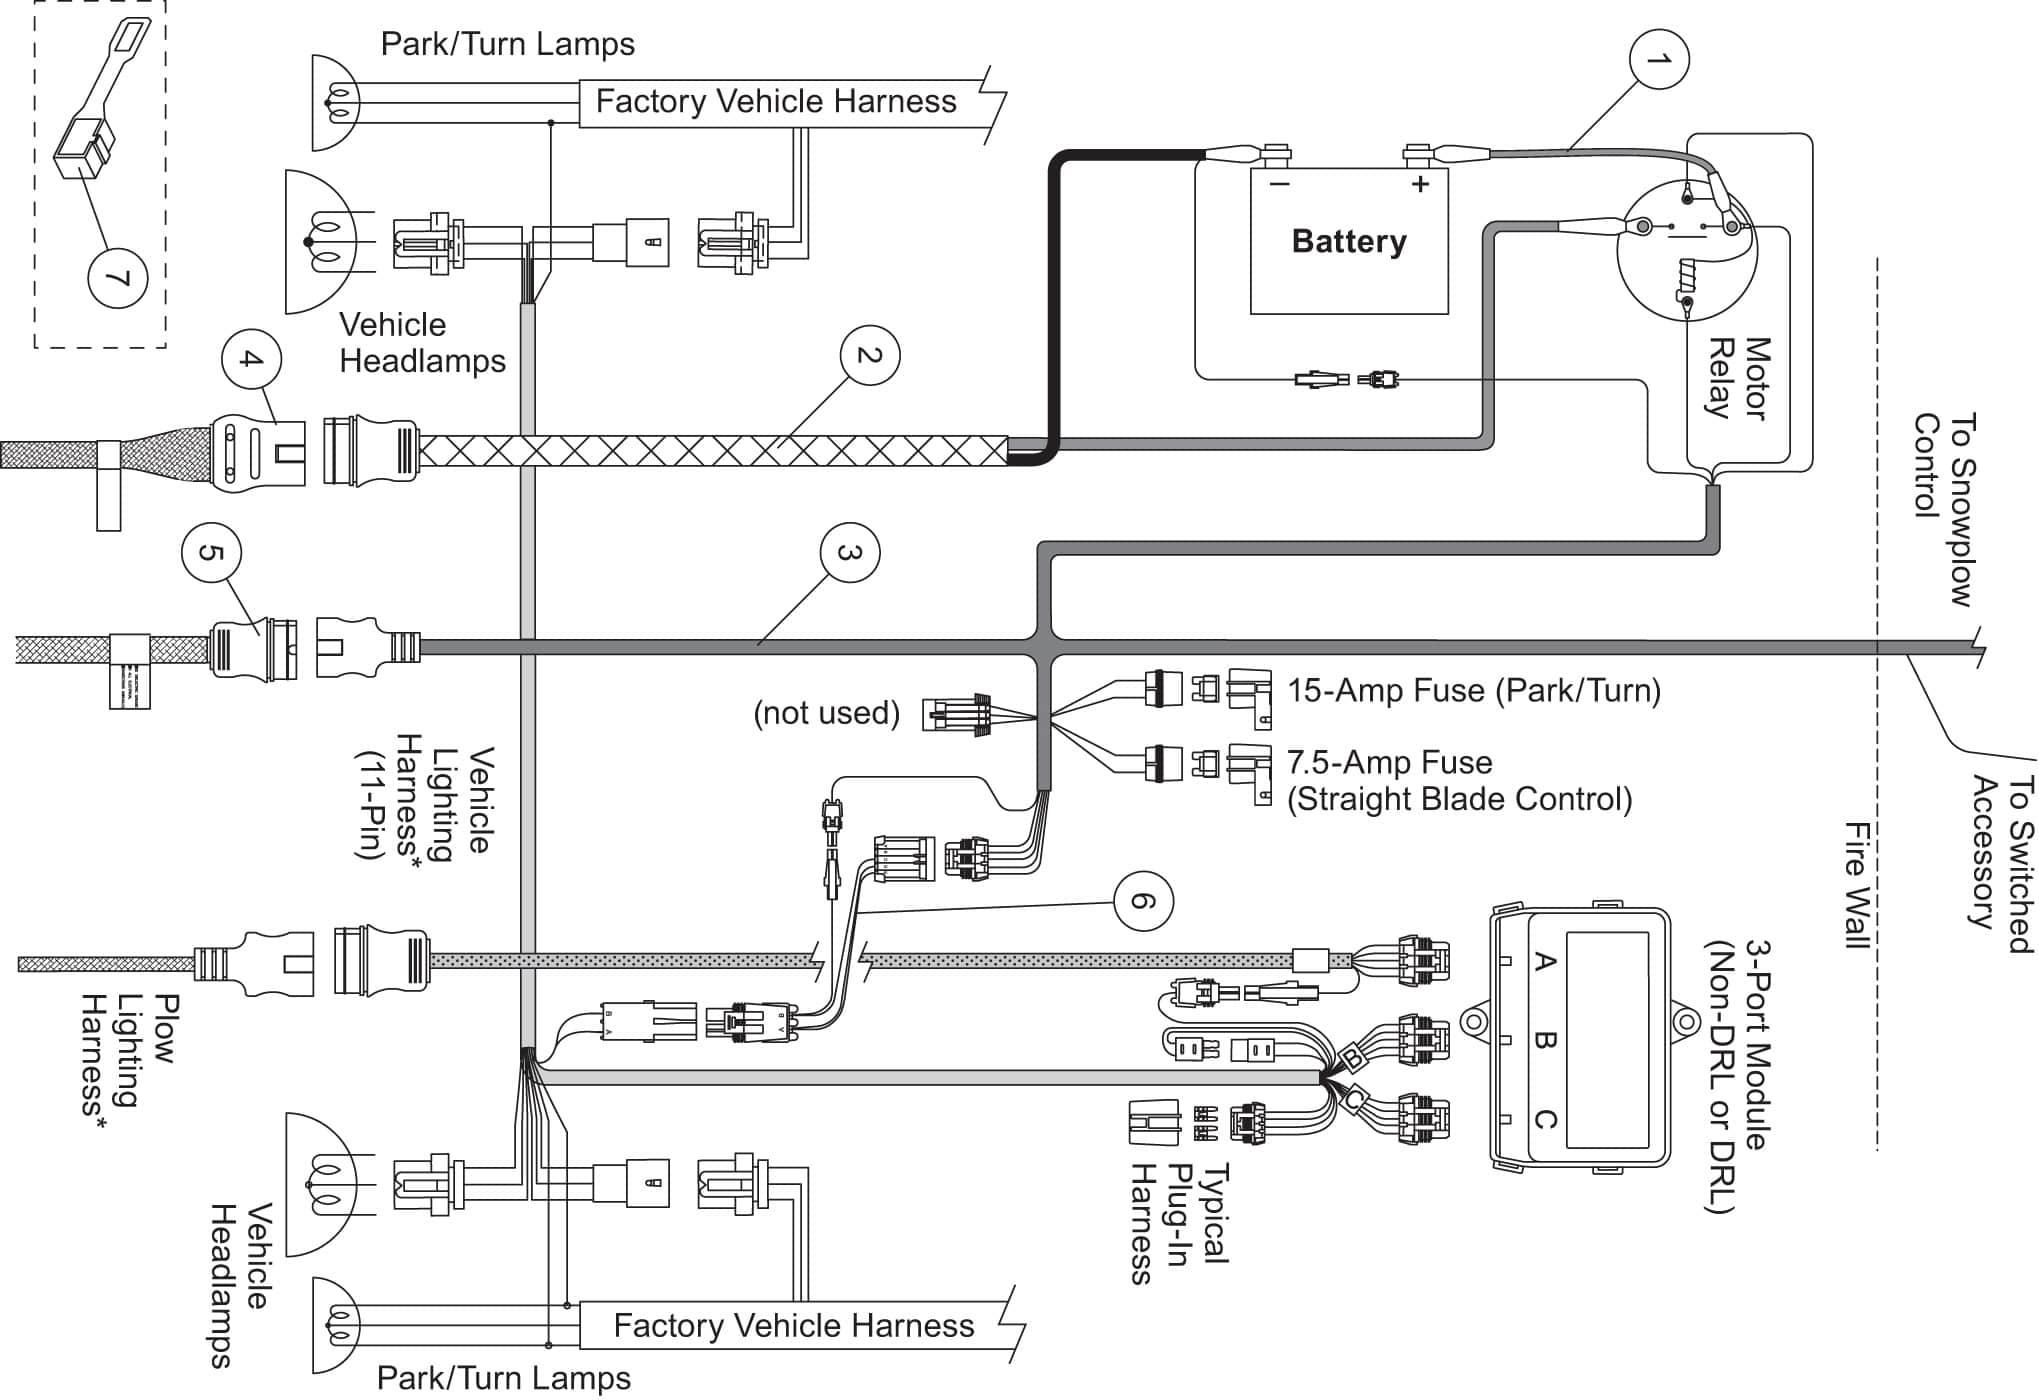 9 Point Western Unimount Wiring Diagram Hayward Pool Pump Motor Wiring Diagram 2 Free Download 1990 300zx Basic Wiring Jeanjaures37 Fr